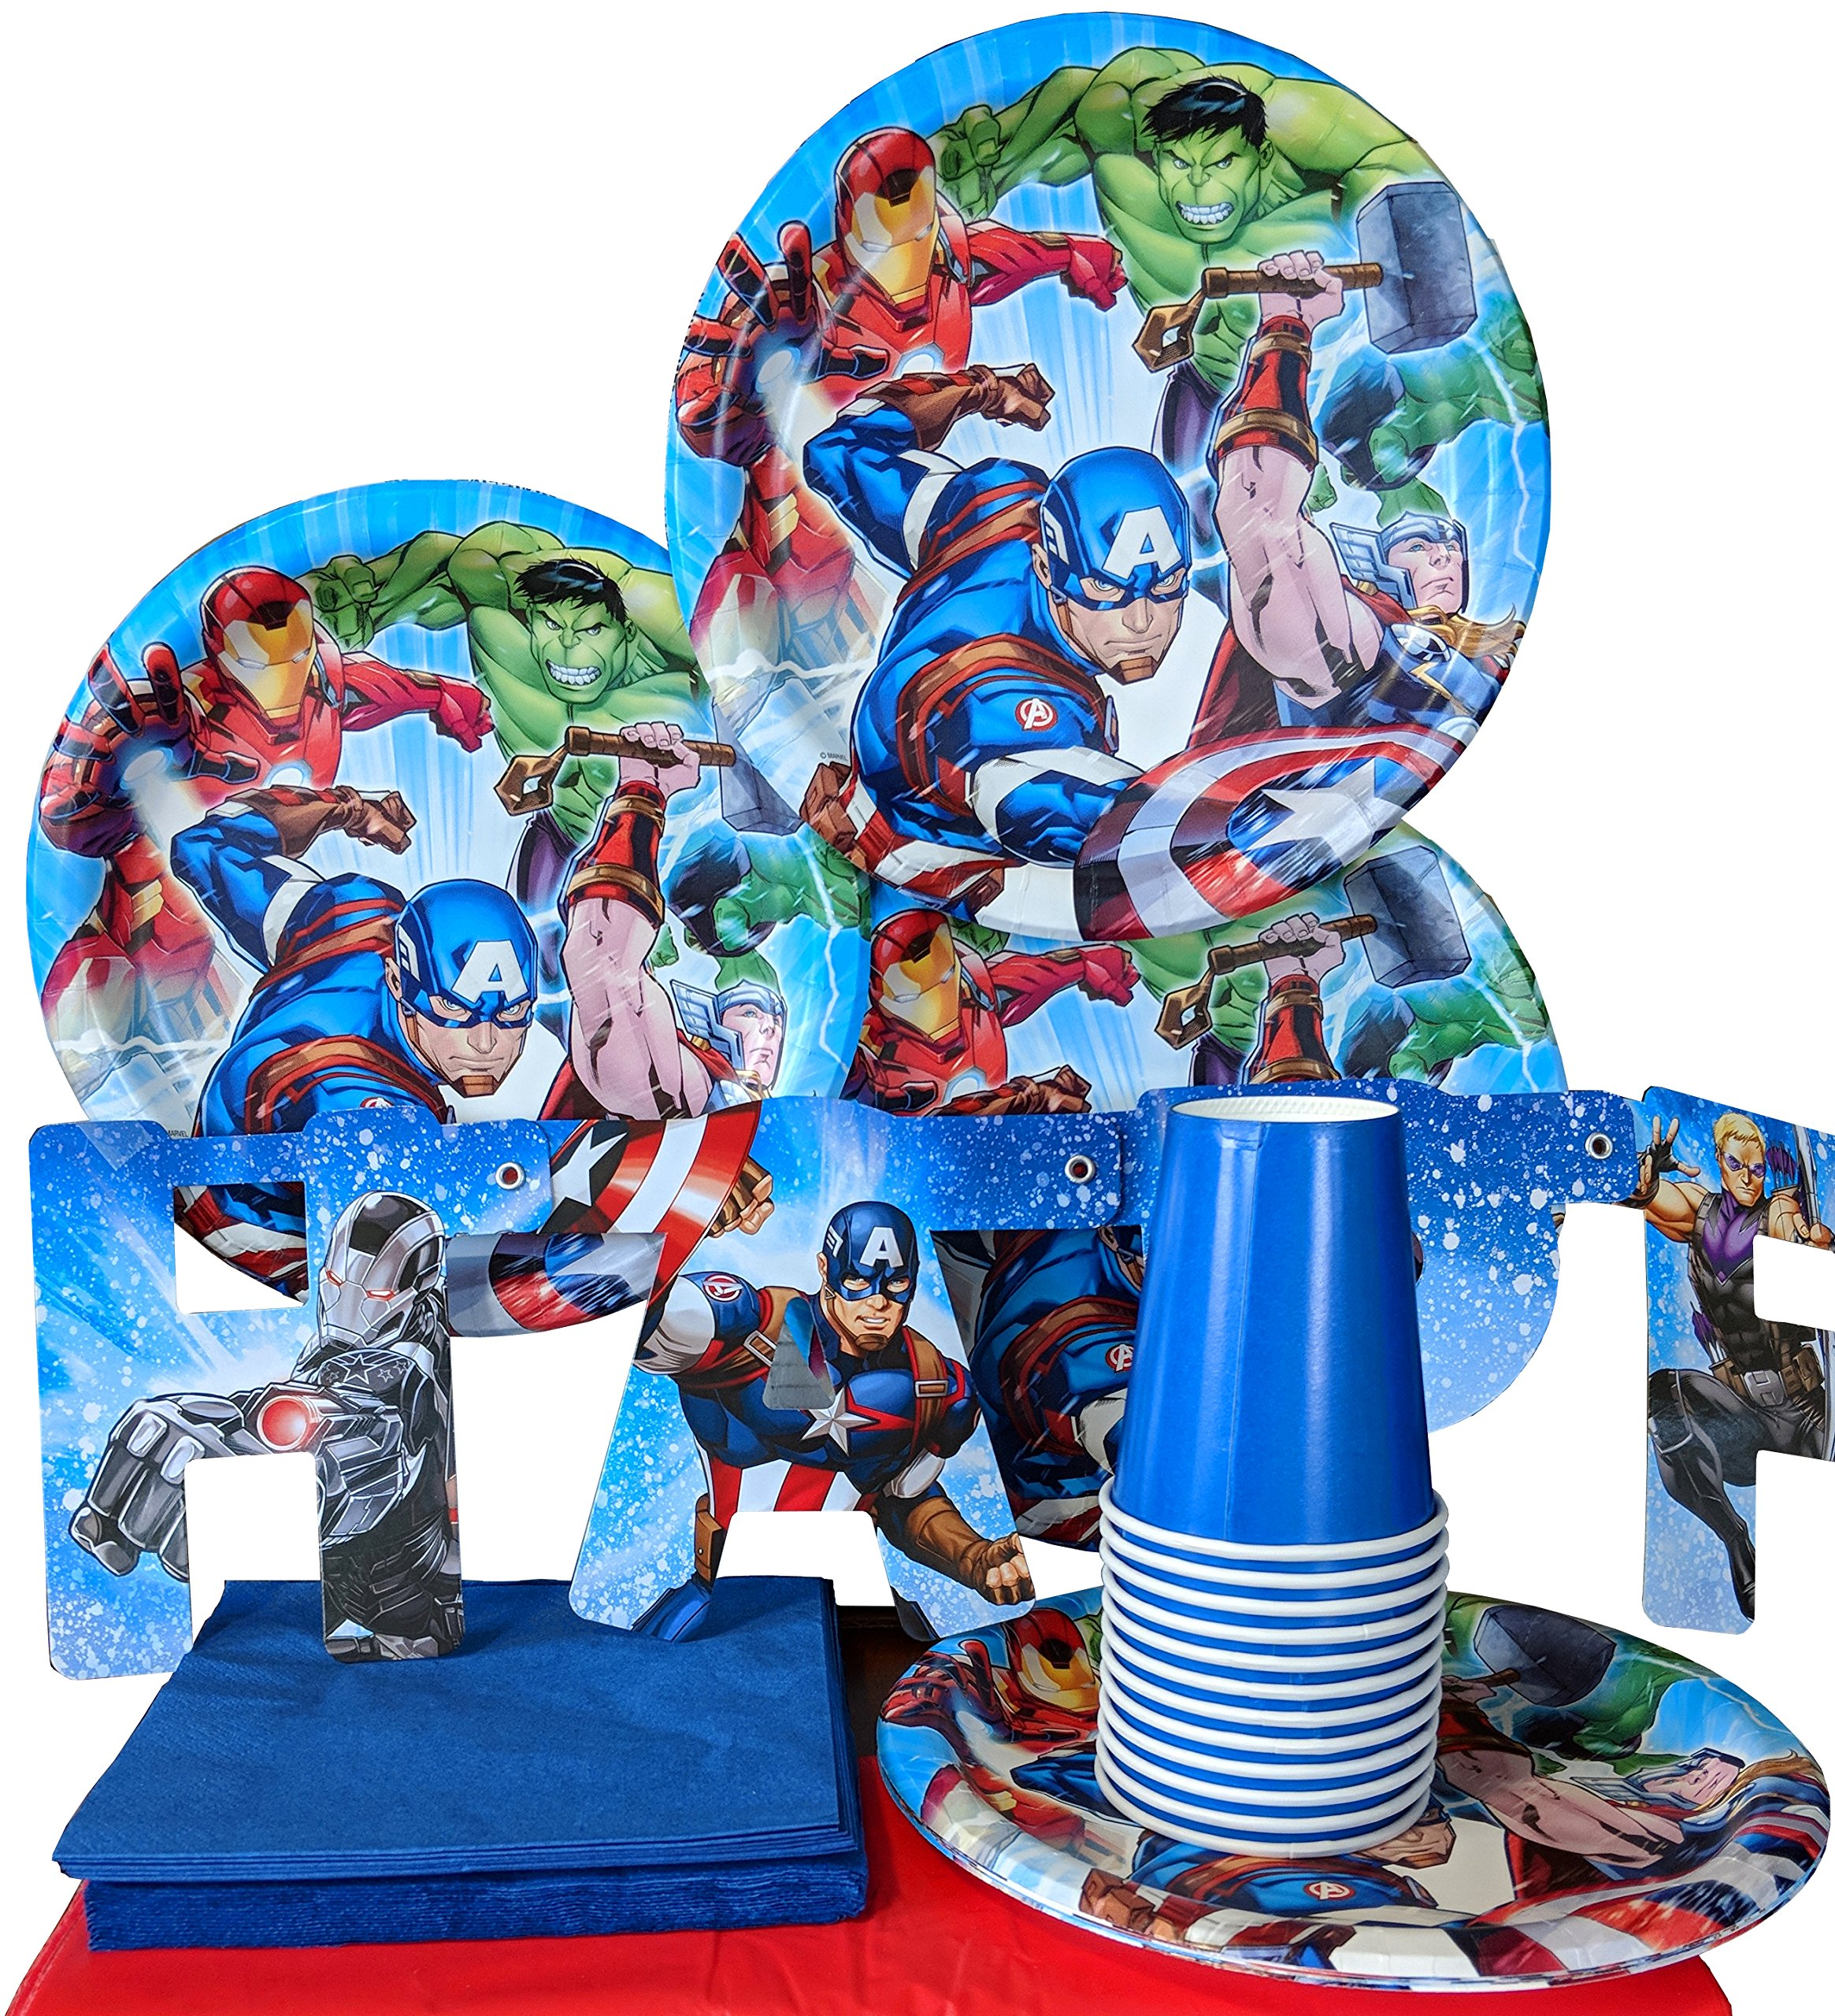 Marvel Avengers Superhero Birthday Plates Napkins Cups Party Supplies Serves 8 by HL Enterprise